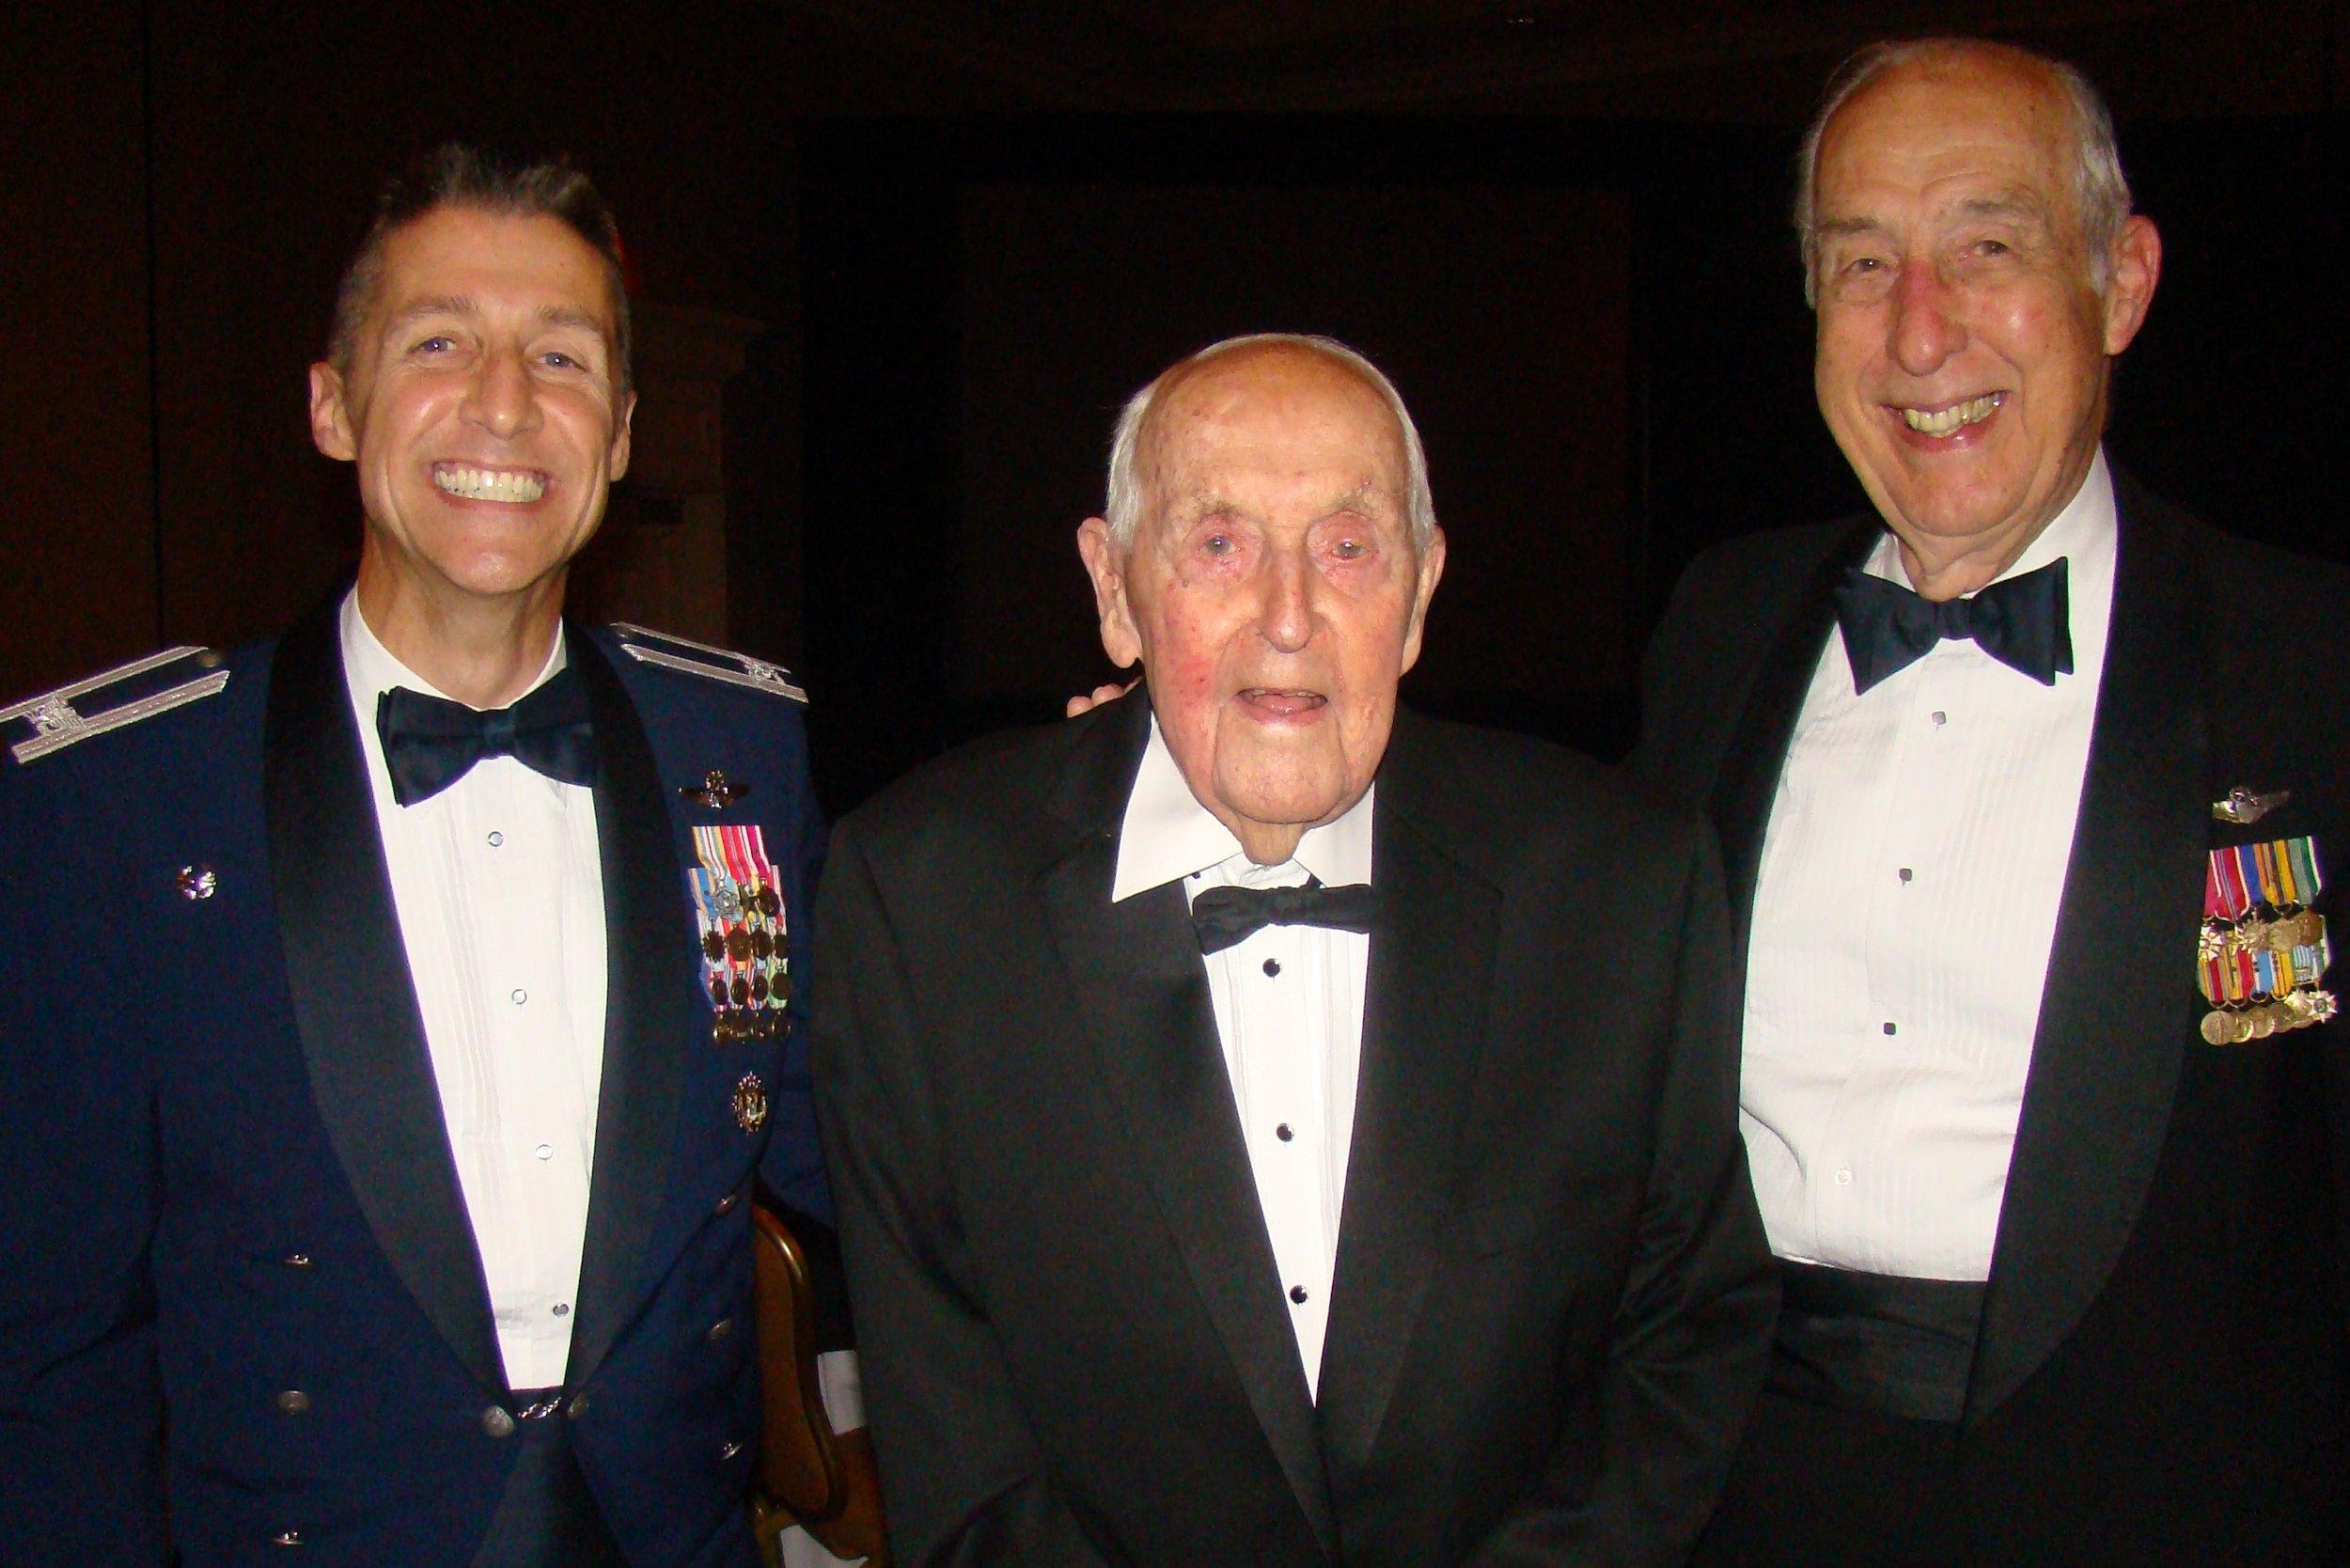 Colonel Scott DeThomas, Sir Lenox Hewitt & Dick Newton, 15 Nov '13 - Copy (2).JPG